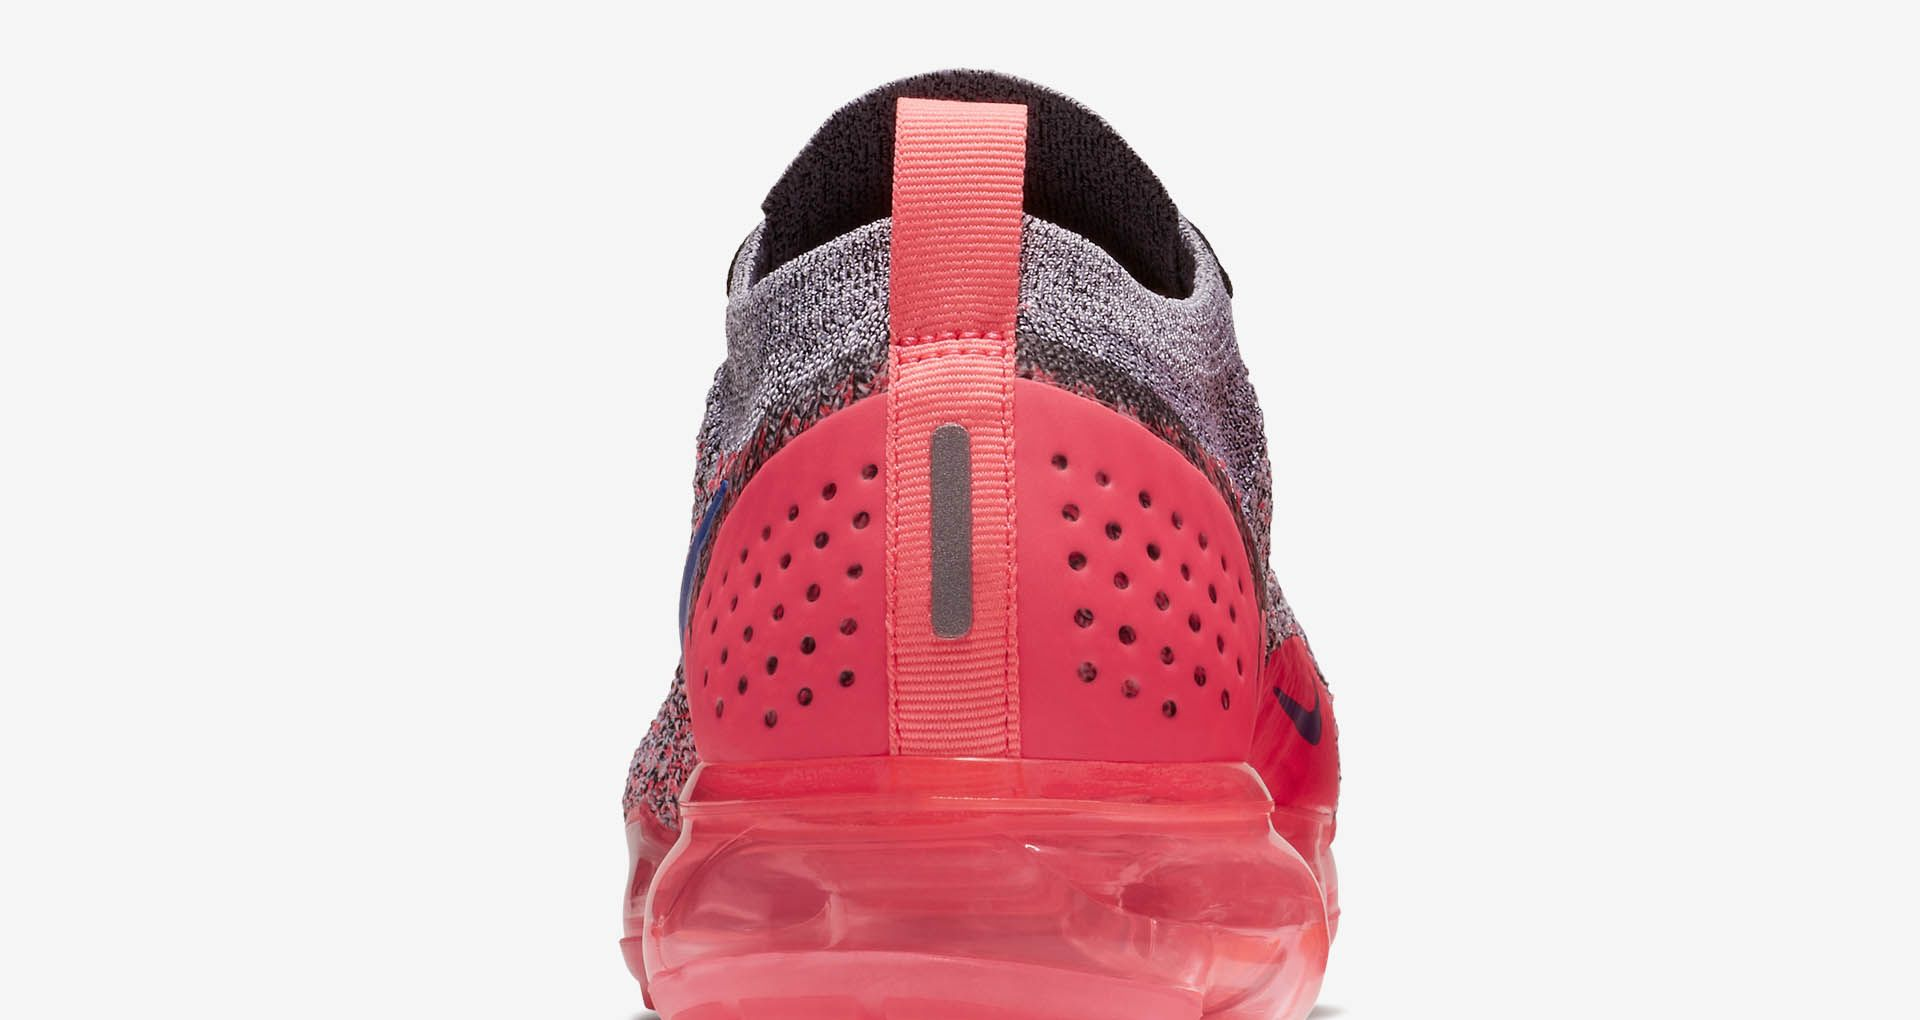 6e934eca1733 Nike Women s Air Vapormax Flyknit 2  Ultramarine   Hot Punch  ...